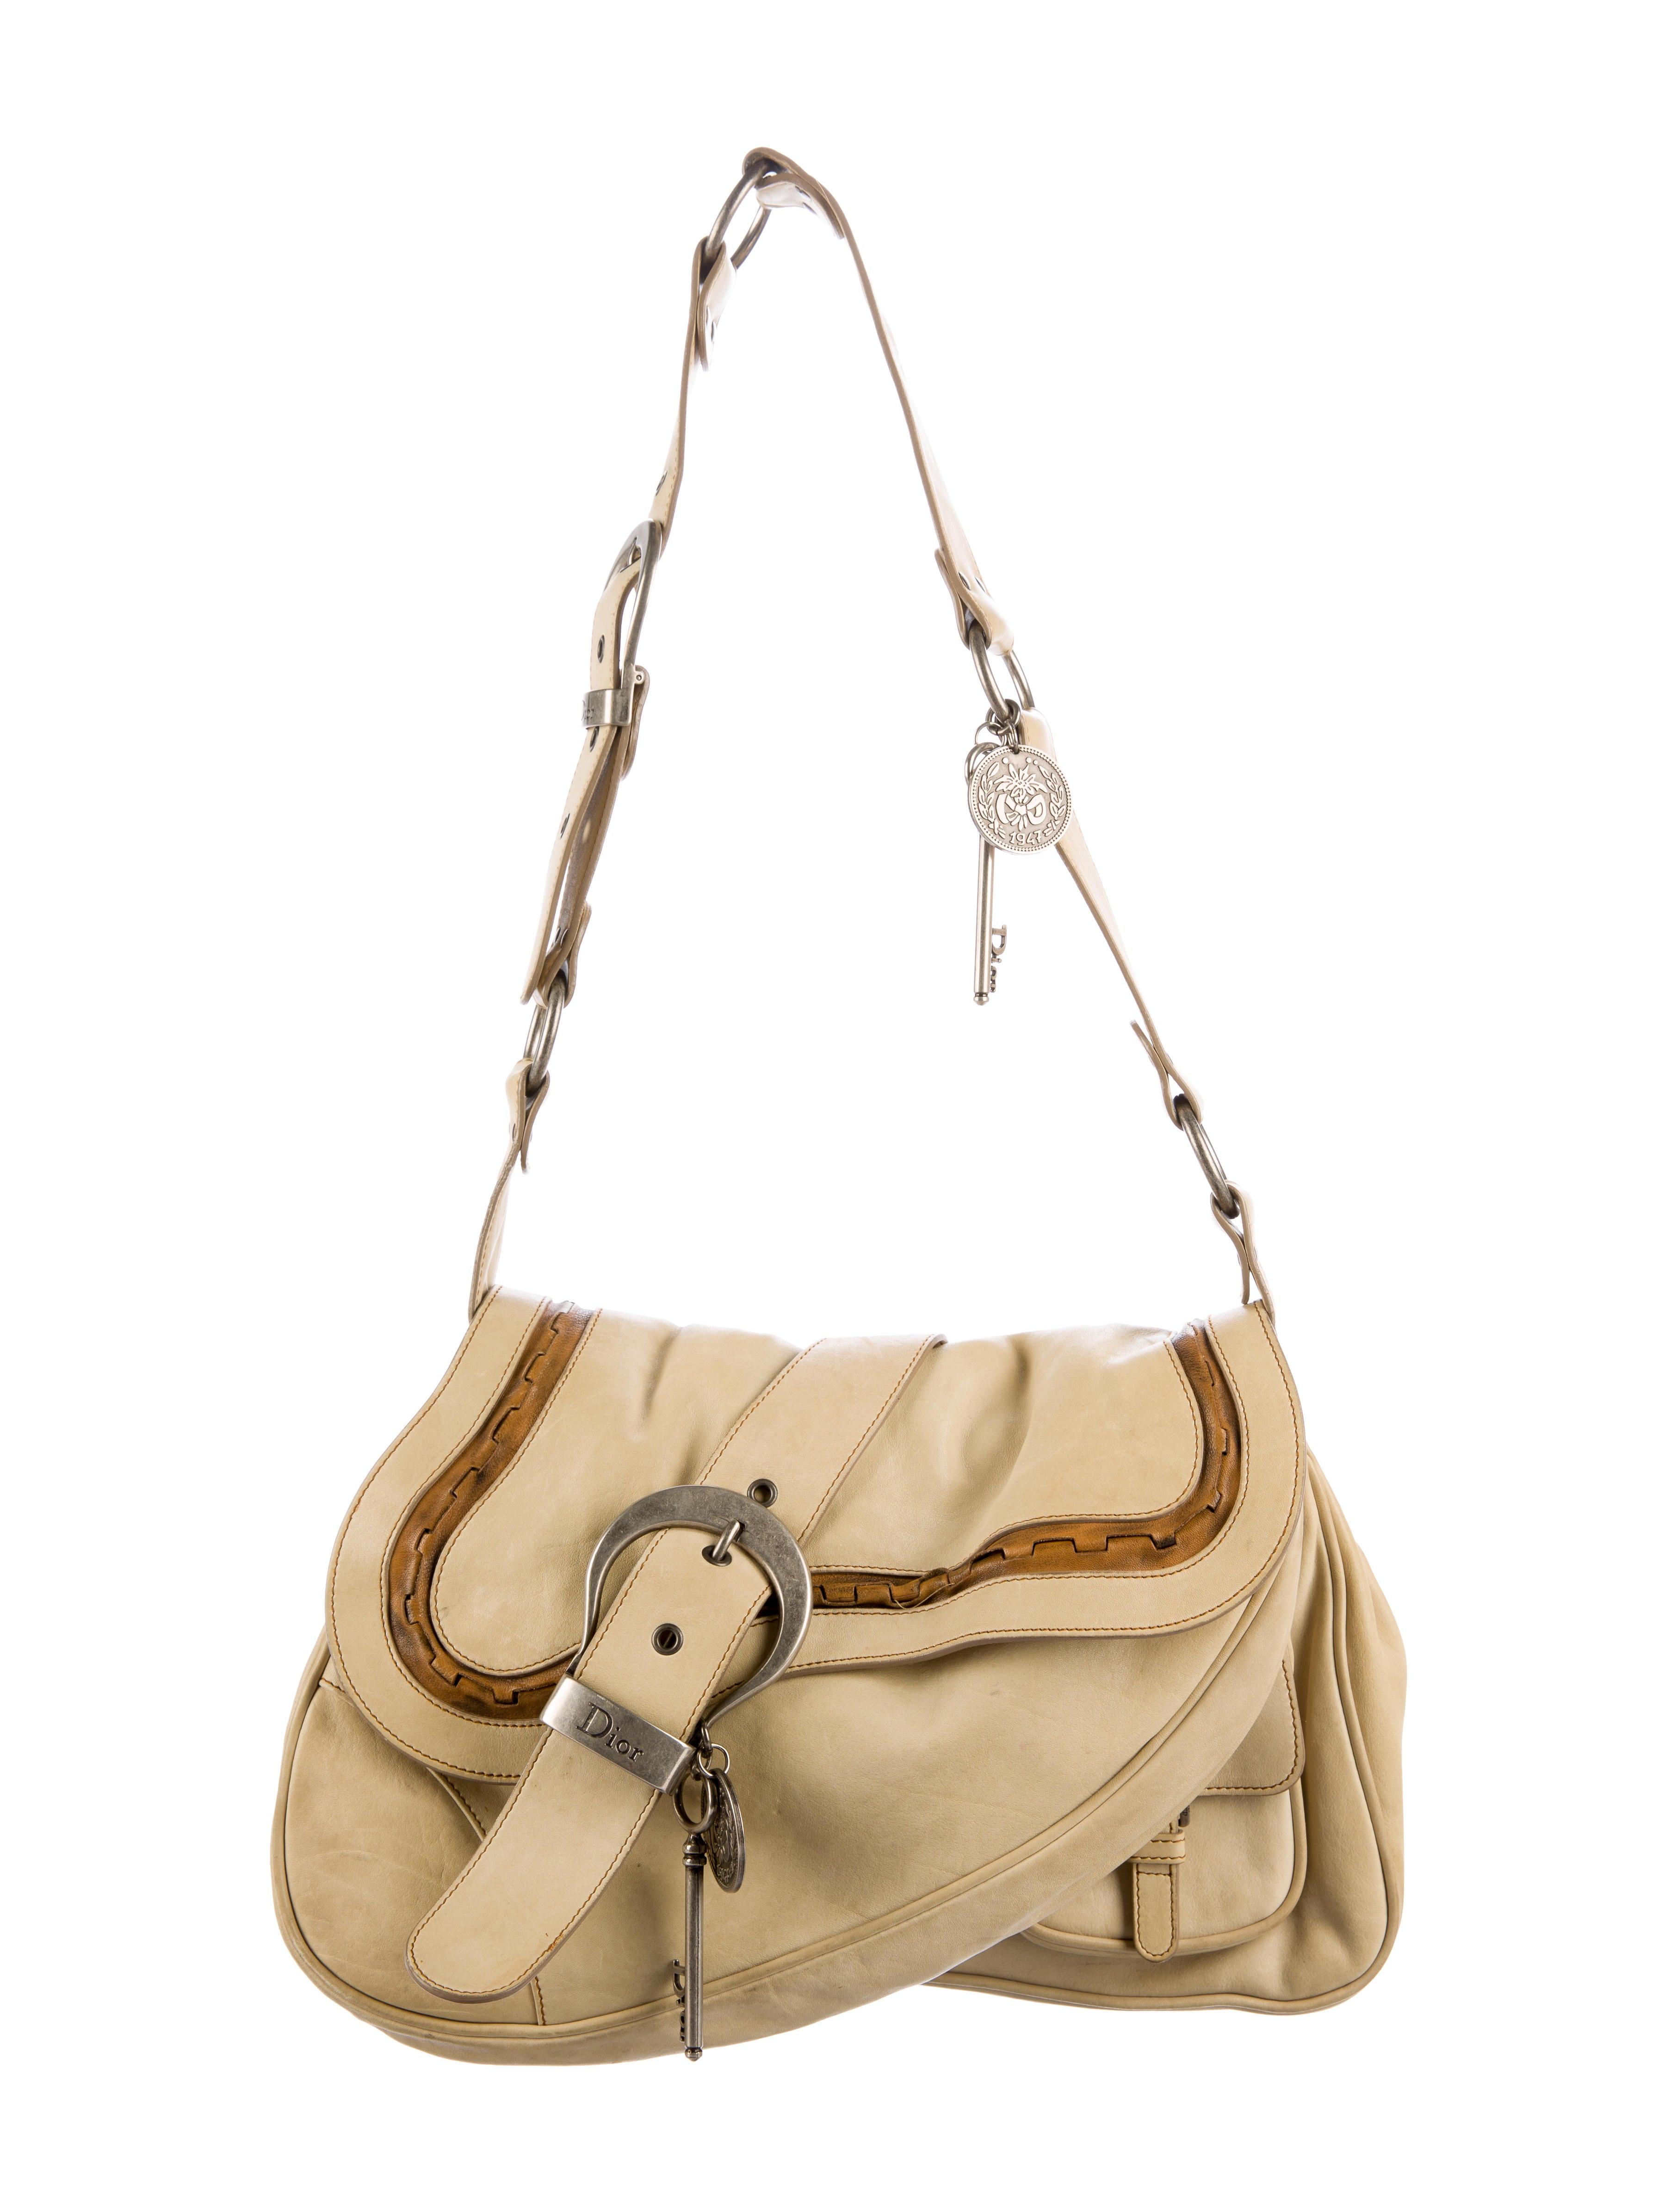 7a80c07a4a19 Christian Dior Gaucho Double Saddle Bag - Handbags - CHR48625